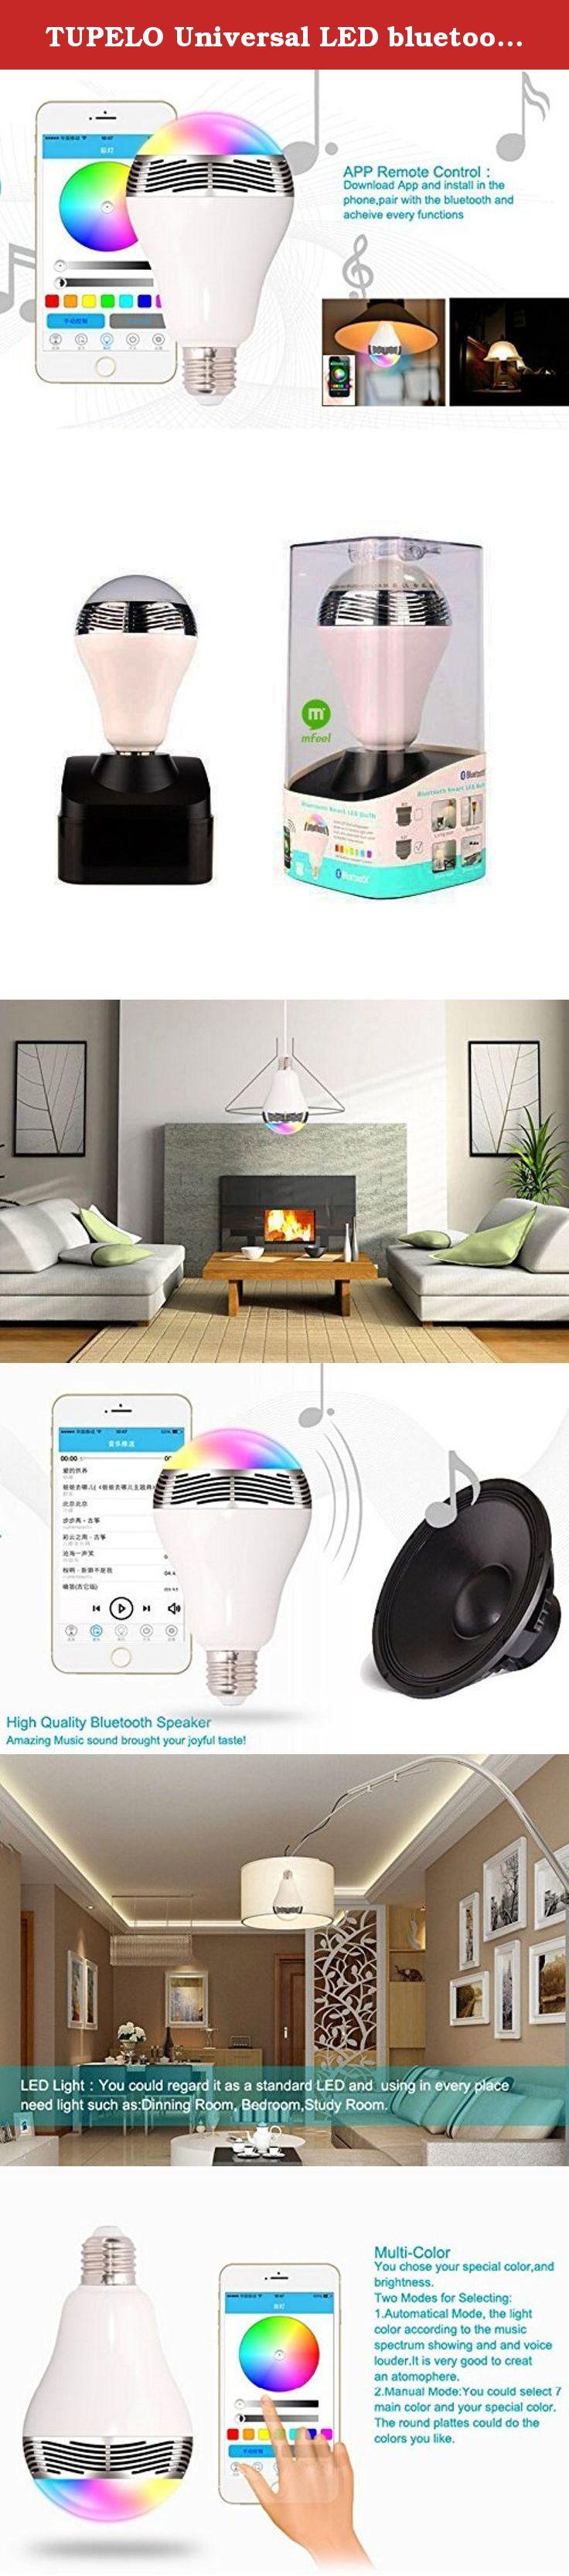 TUPELO Universal LED bluetooth speaker bulb Dimmable